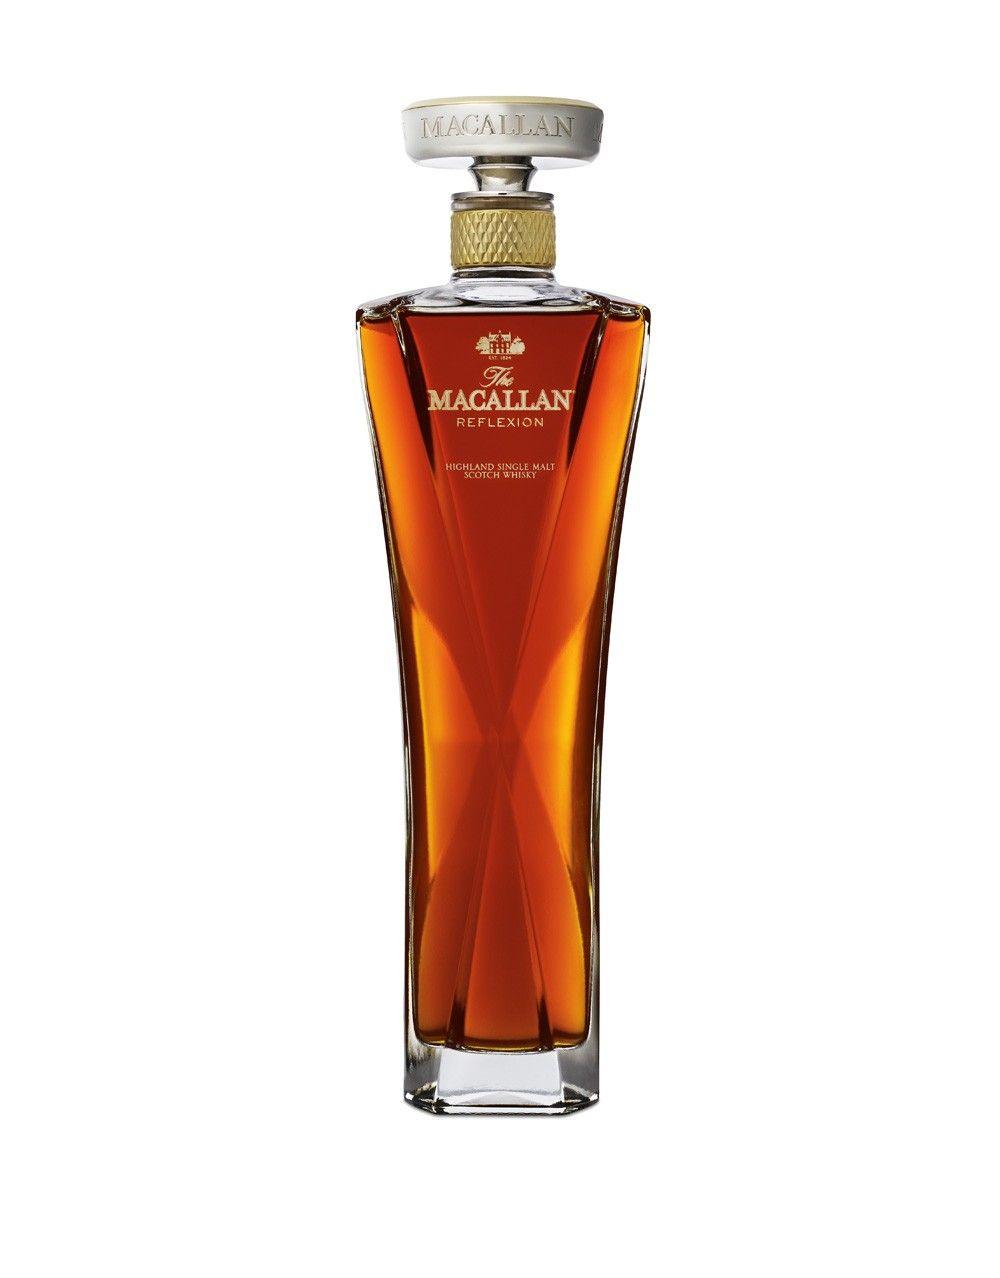 The Macallan Reflexion Perfume Bottles Perfume Whiskey Lover